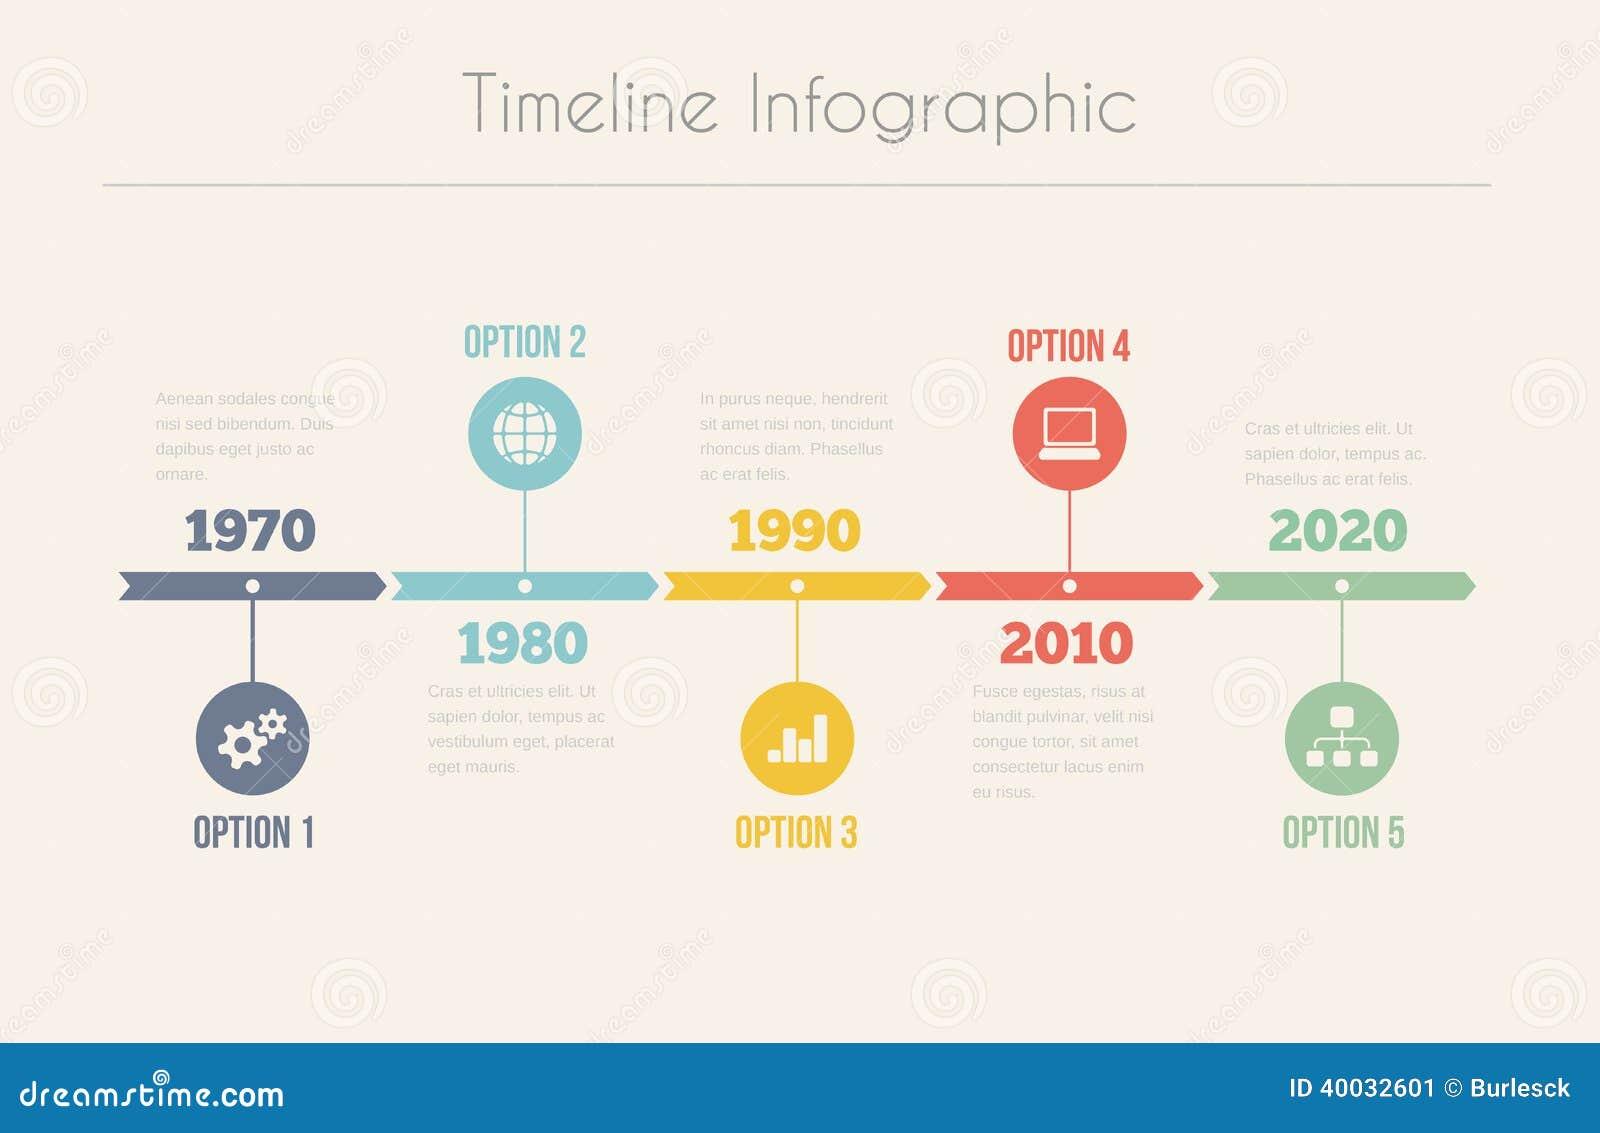 Retro Timeline Infographic Stock Vector - Image: 40032601